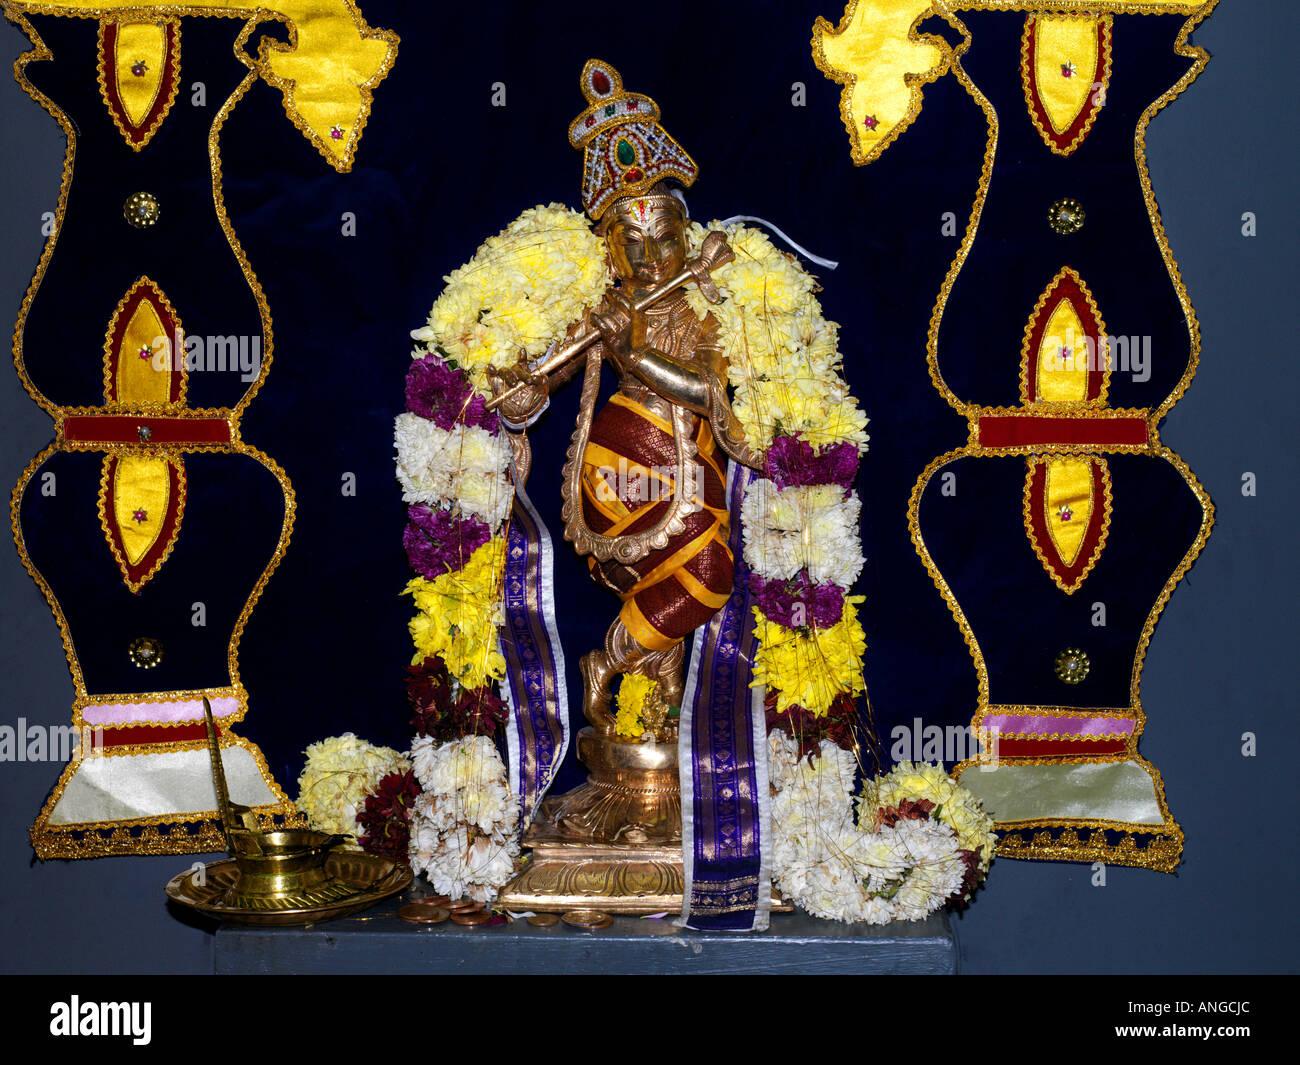 Murugan Tamil Temple New Malden Surrey England Lord Krishna and Offerings - Stock Image